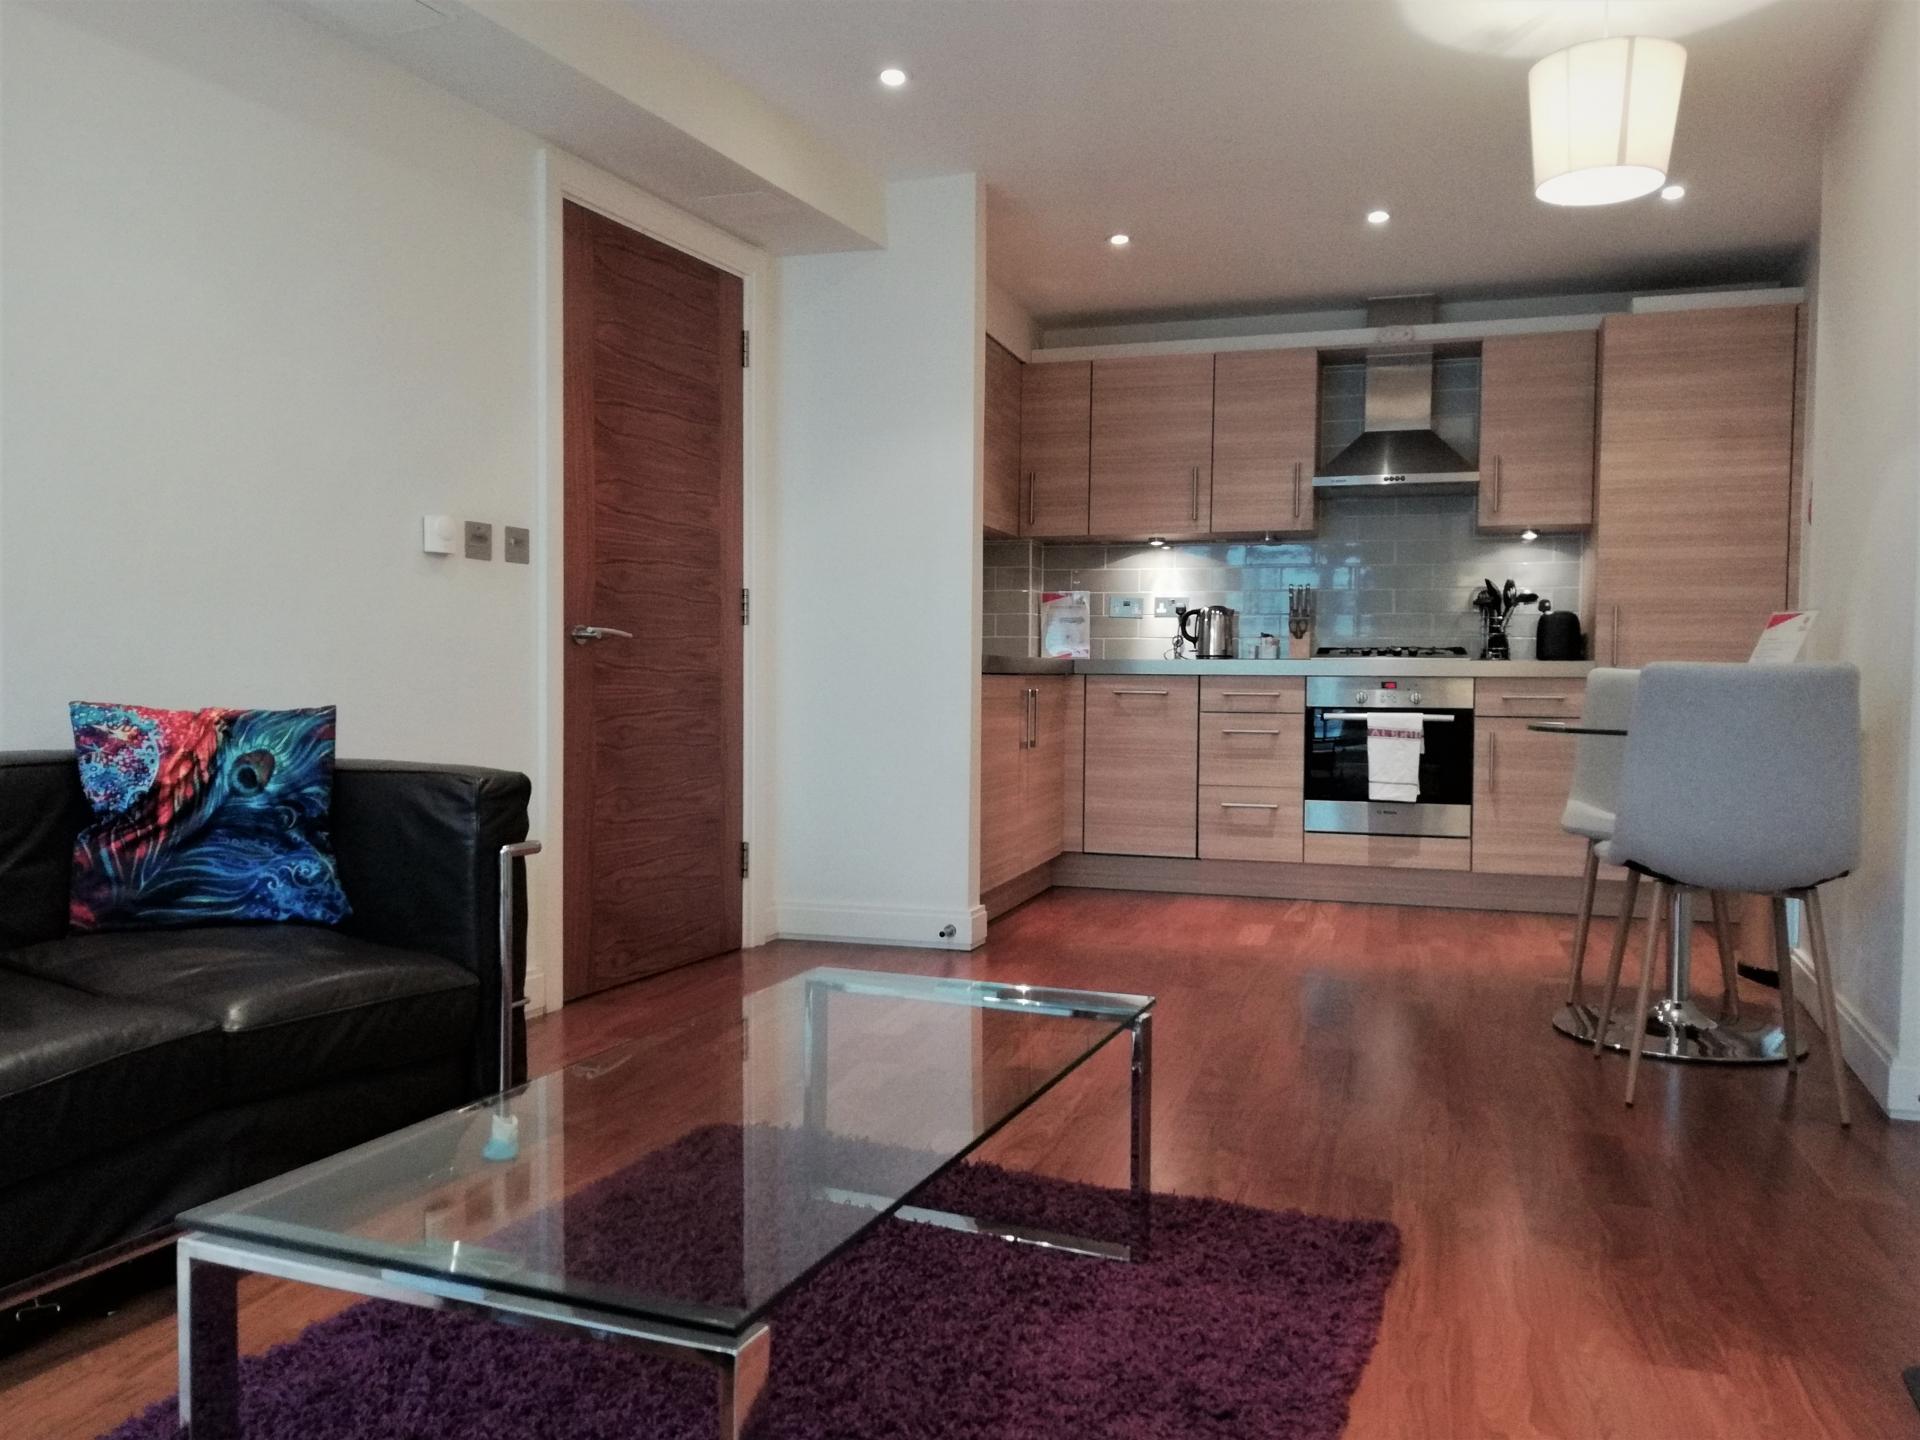 Open plan living at Still Life Barbican, Barbican, London - Citybase Apartments